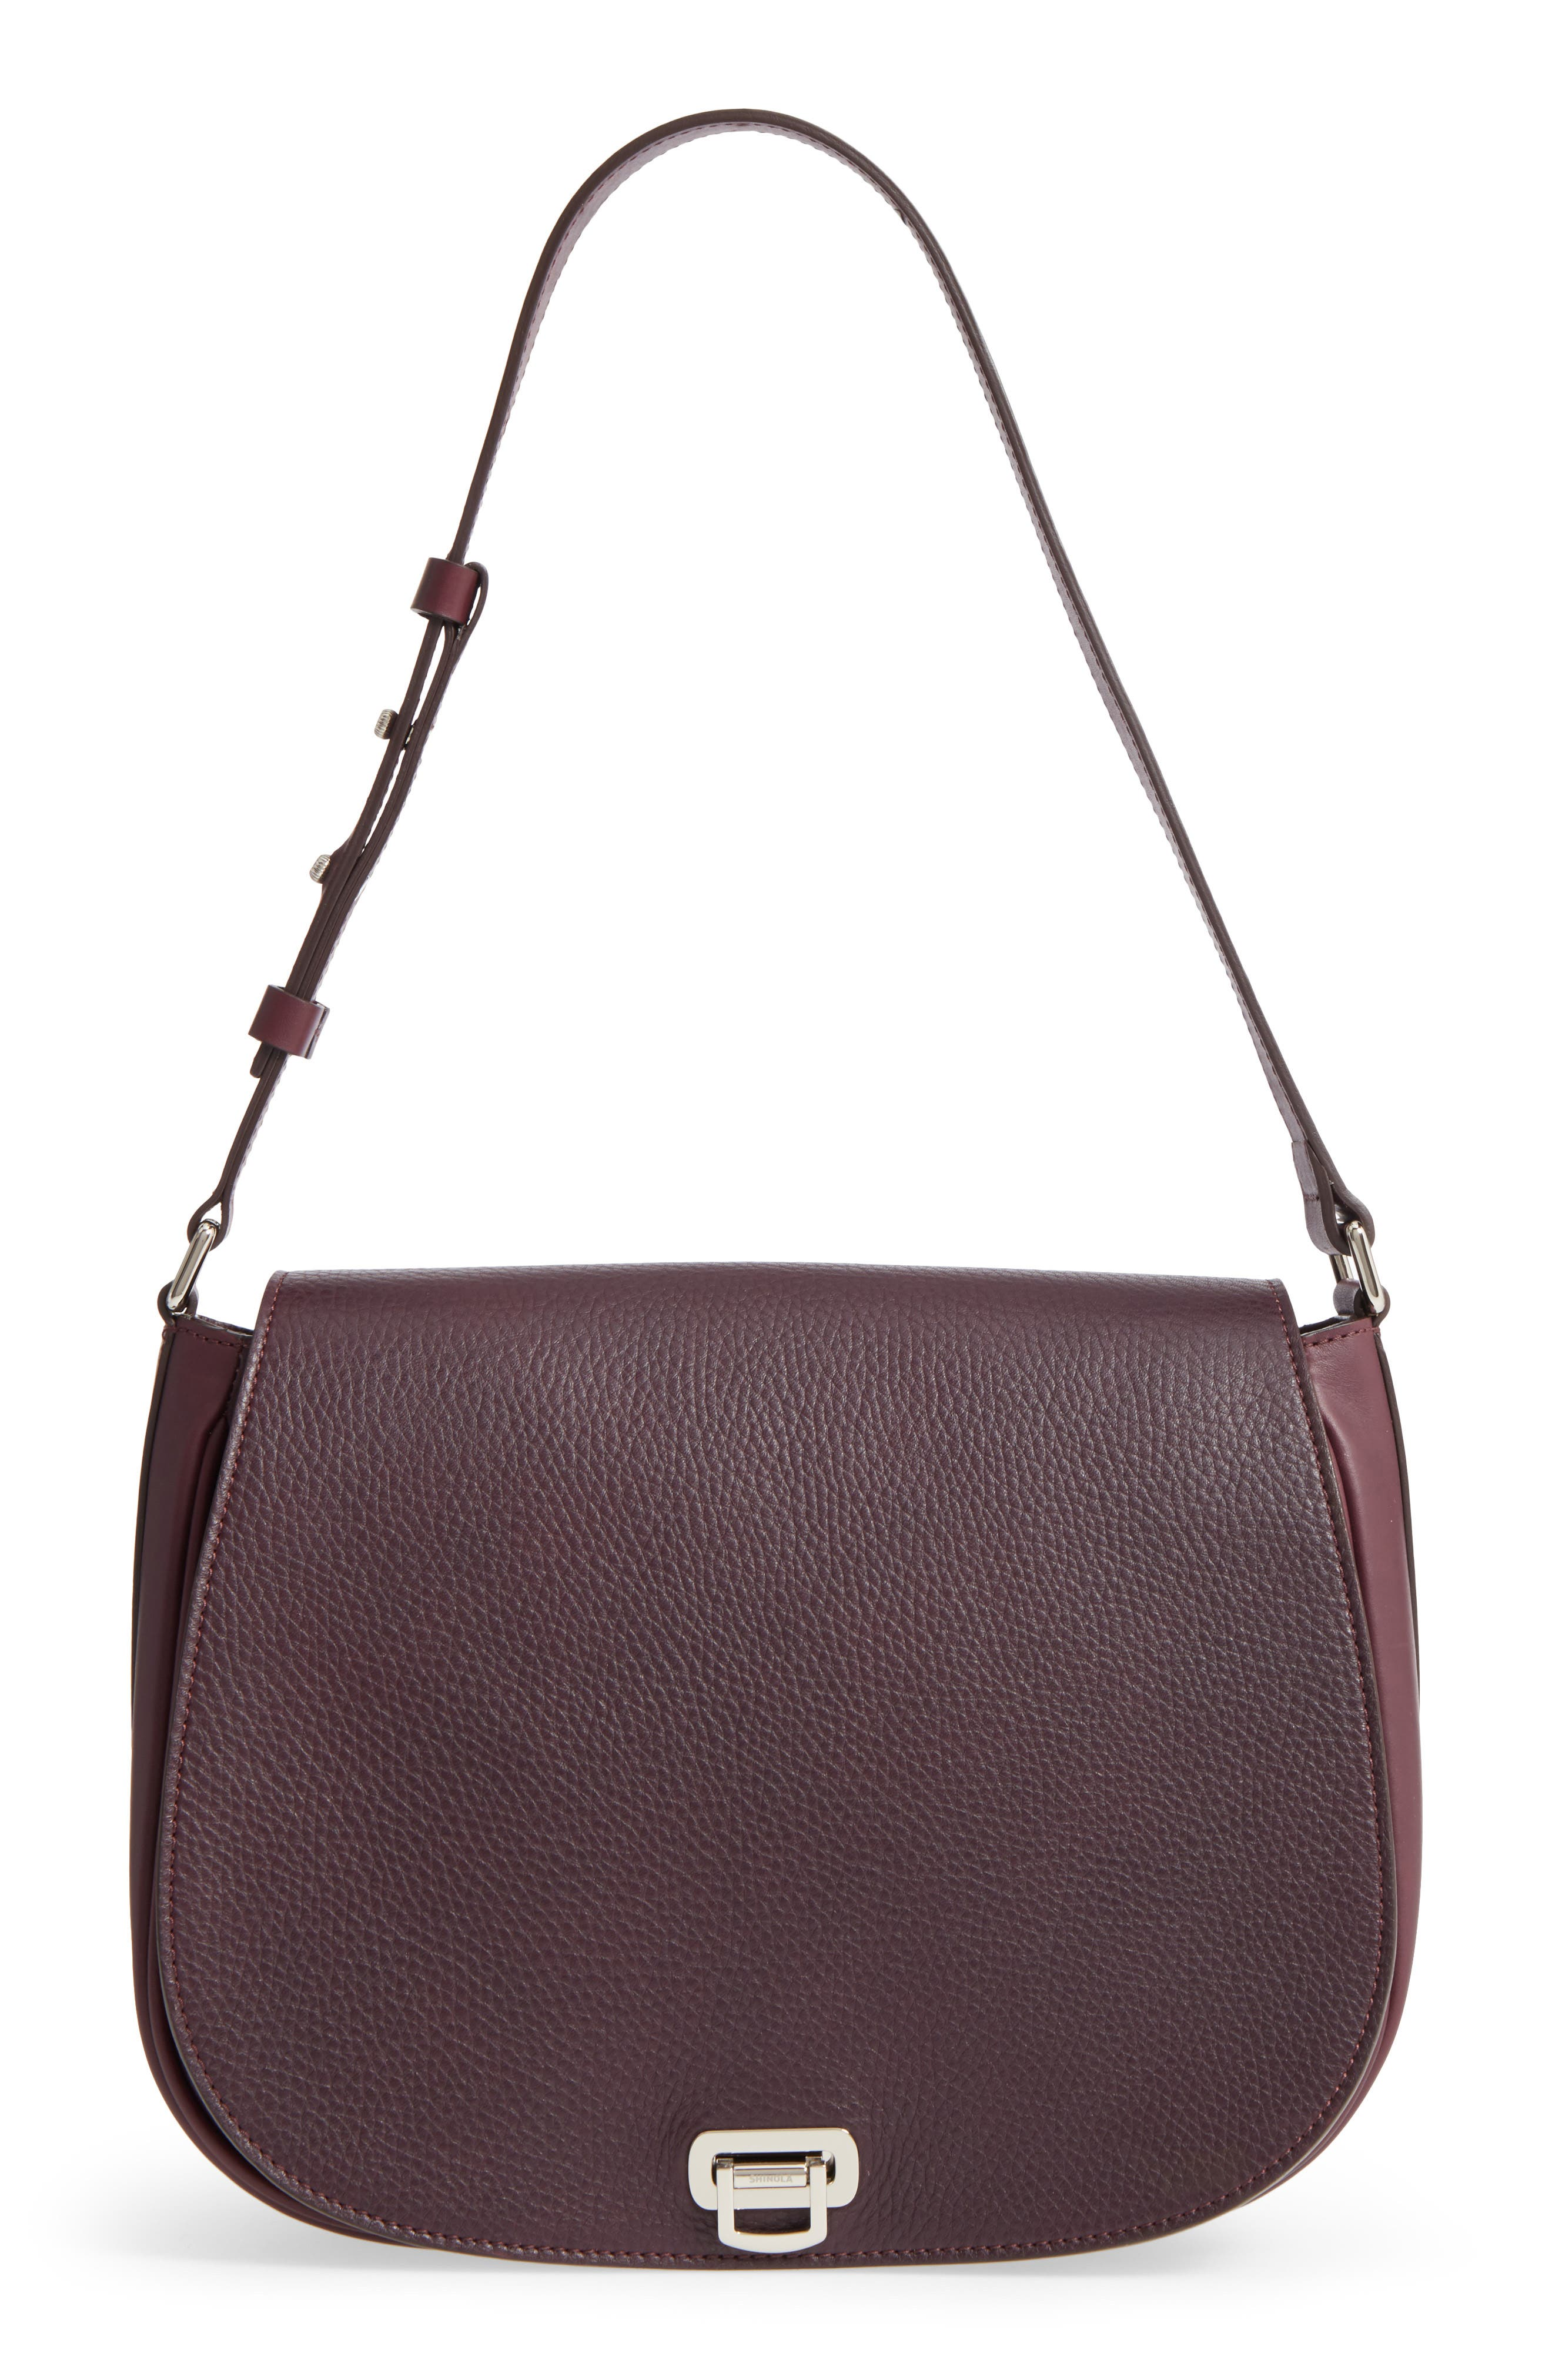 Main Image - Shinola Calfskin Leather Shoulder Bag